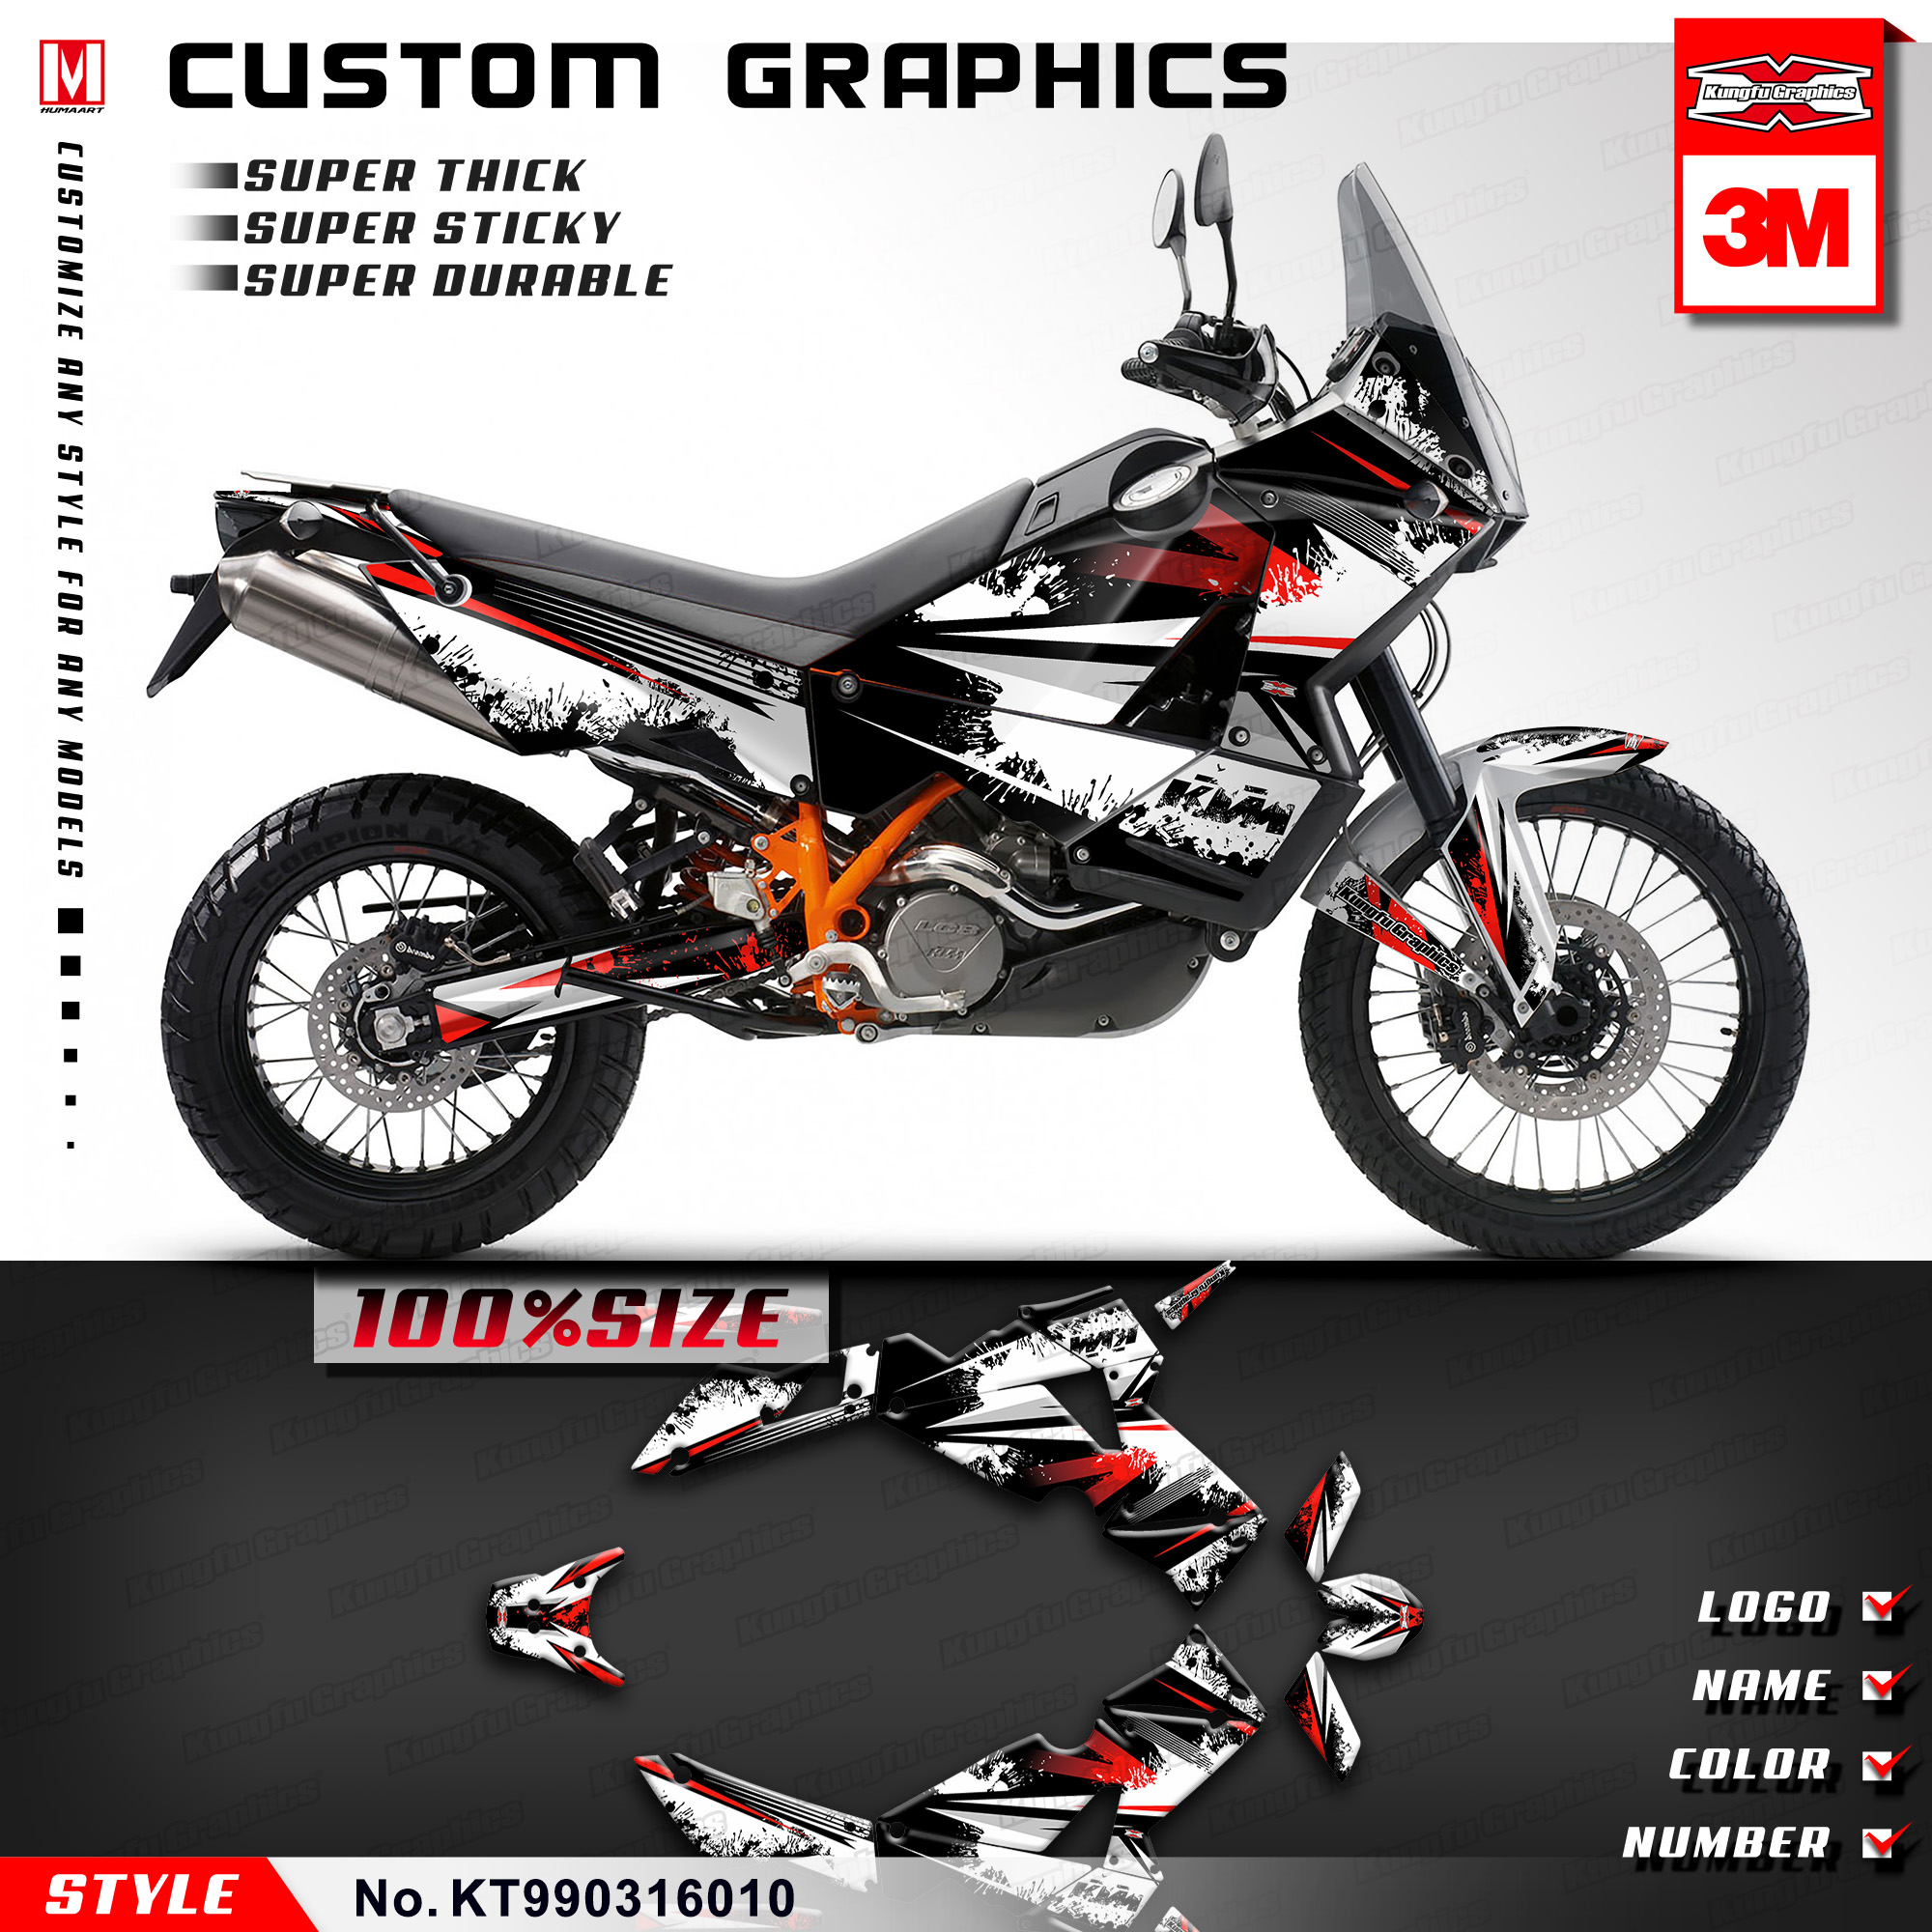 Stickers Dekor-Kit Kungfu-Graphics-Vehicle Adventure KTM Wraps White Black for 2003 Style-No.-Kt990316010